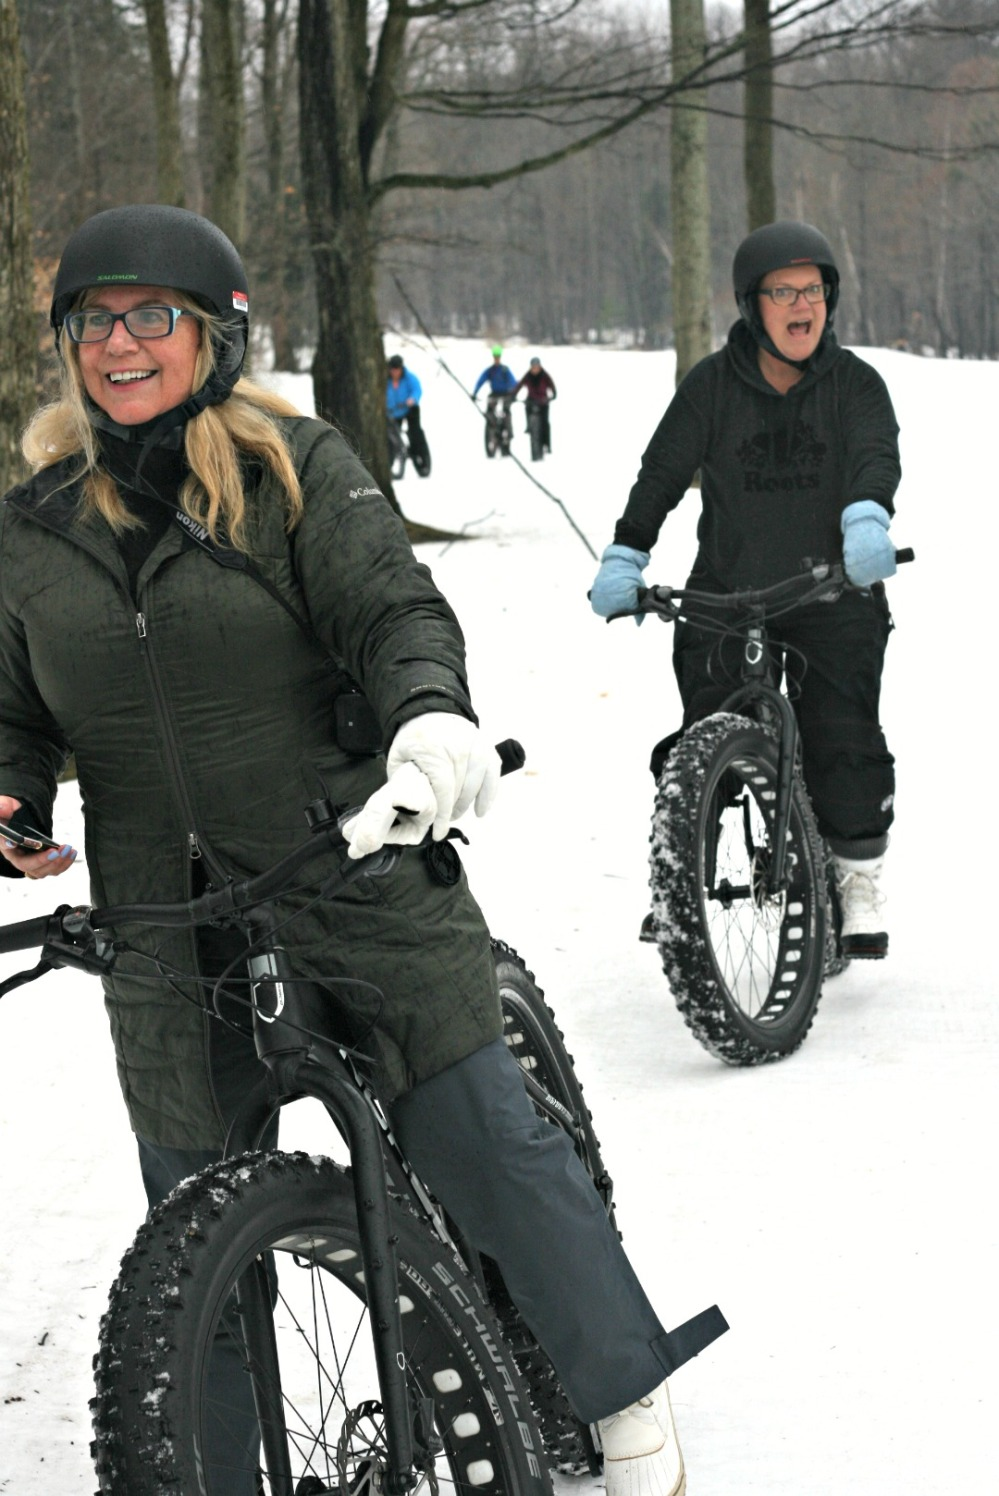 lgm linda and julie biking